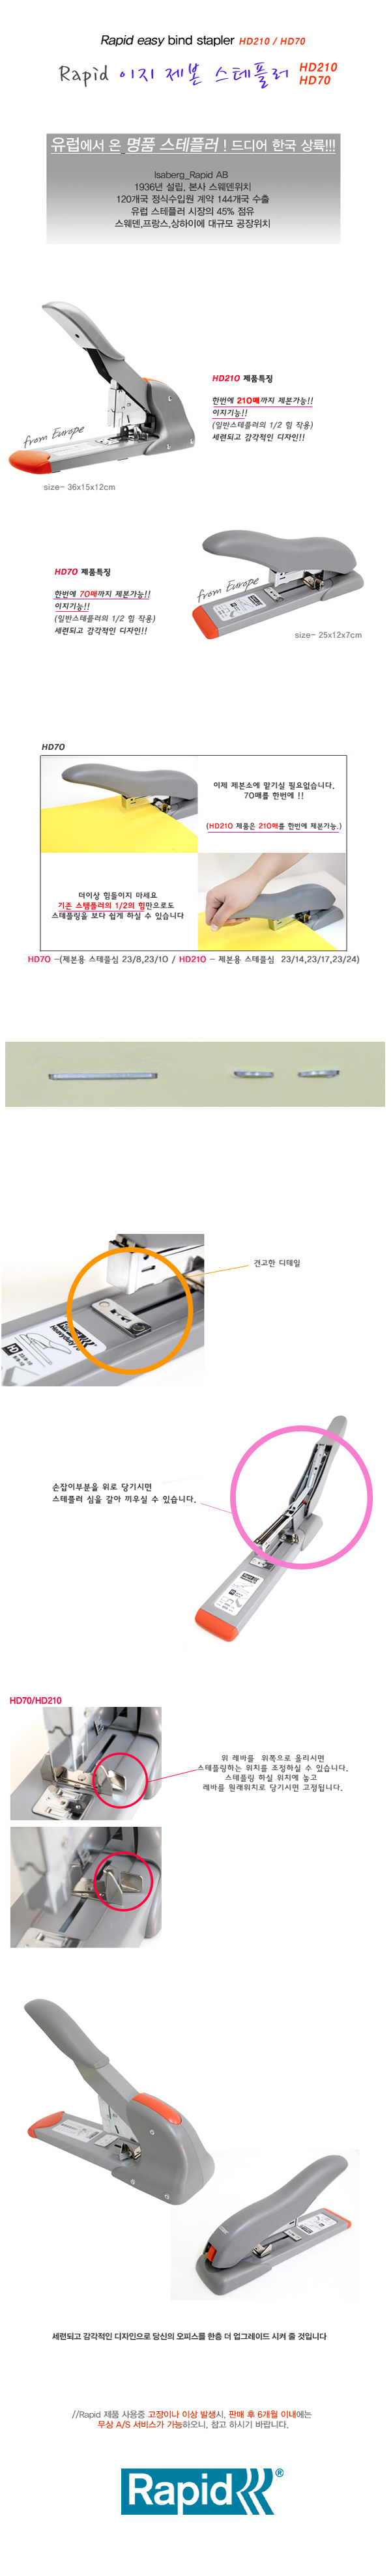 Rapid HD시리즈 이지제본 스테플러 모음52,000원-래피드디자인문구, 오피스 용품, 스테플러, 제본용 스테플러바보사랑Rapid HD시리즈 이지제본 스테플러 모음52,000원-래피드디자인문구, 오피스 용품, 스테플러, 제본용 스테플러바보사랑